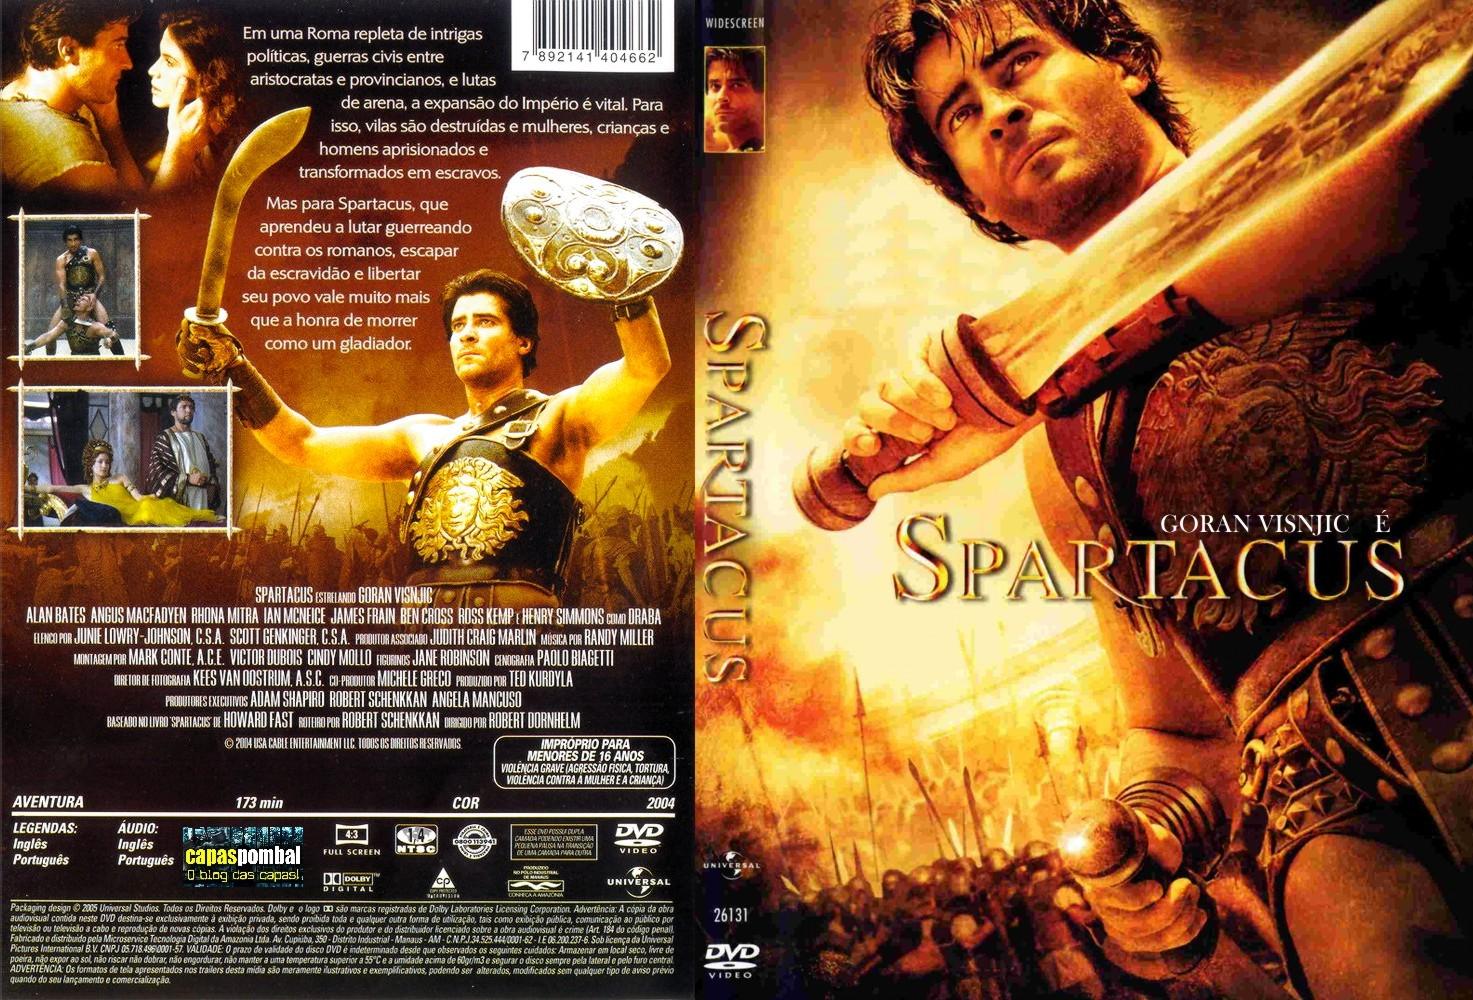 Filme Spartacus with capas filmes Épicos: spartacus